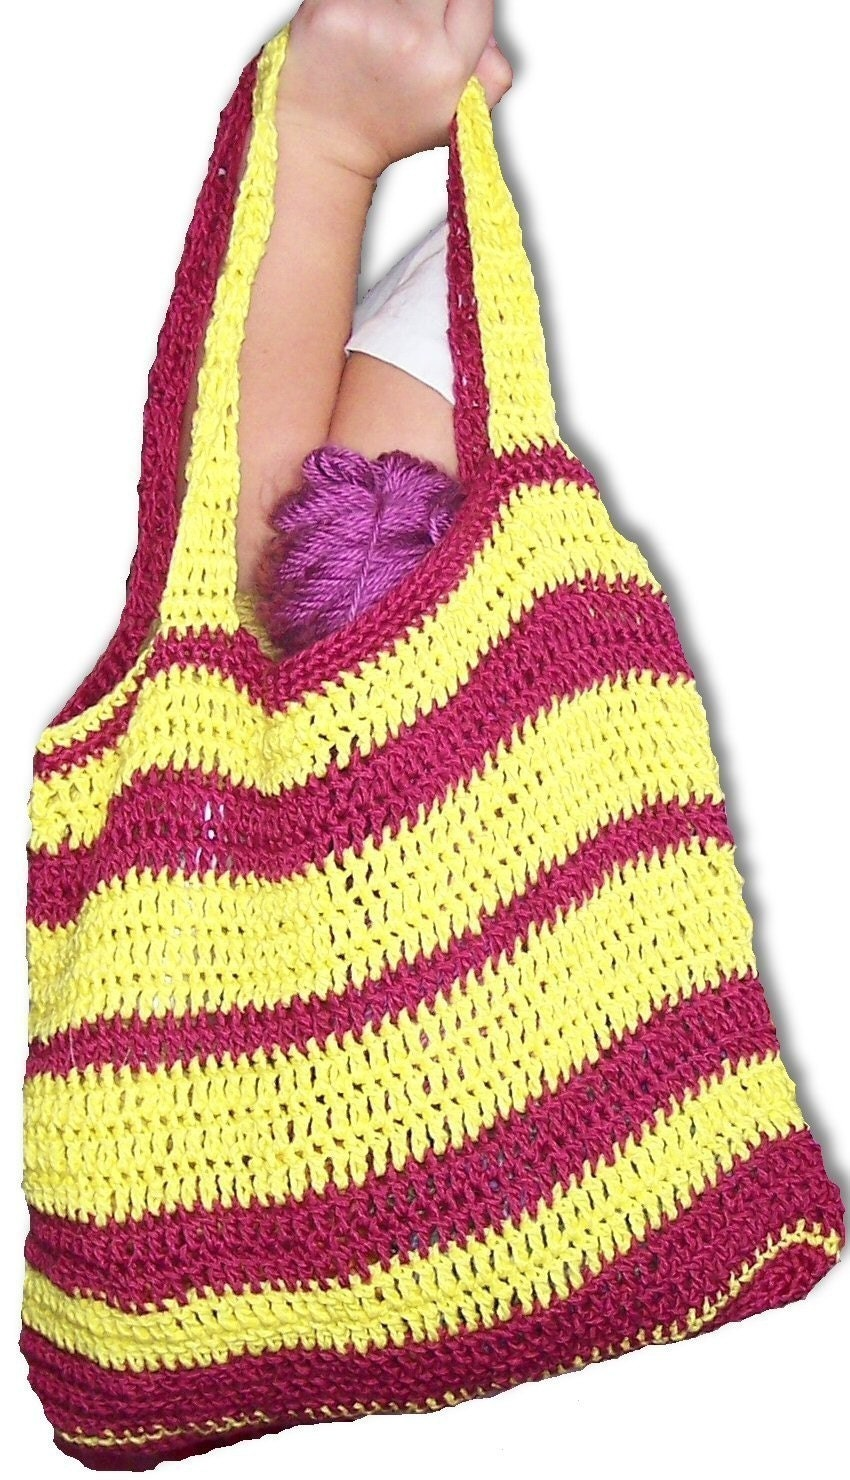 CROCHET BAG INSTRUCTIONS - Crochet ? Learn How to Crochet